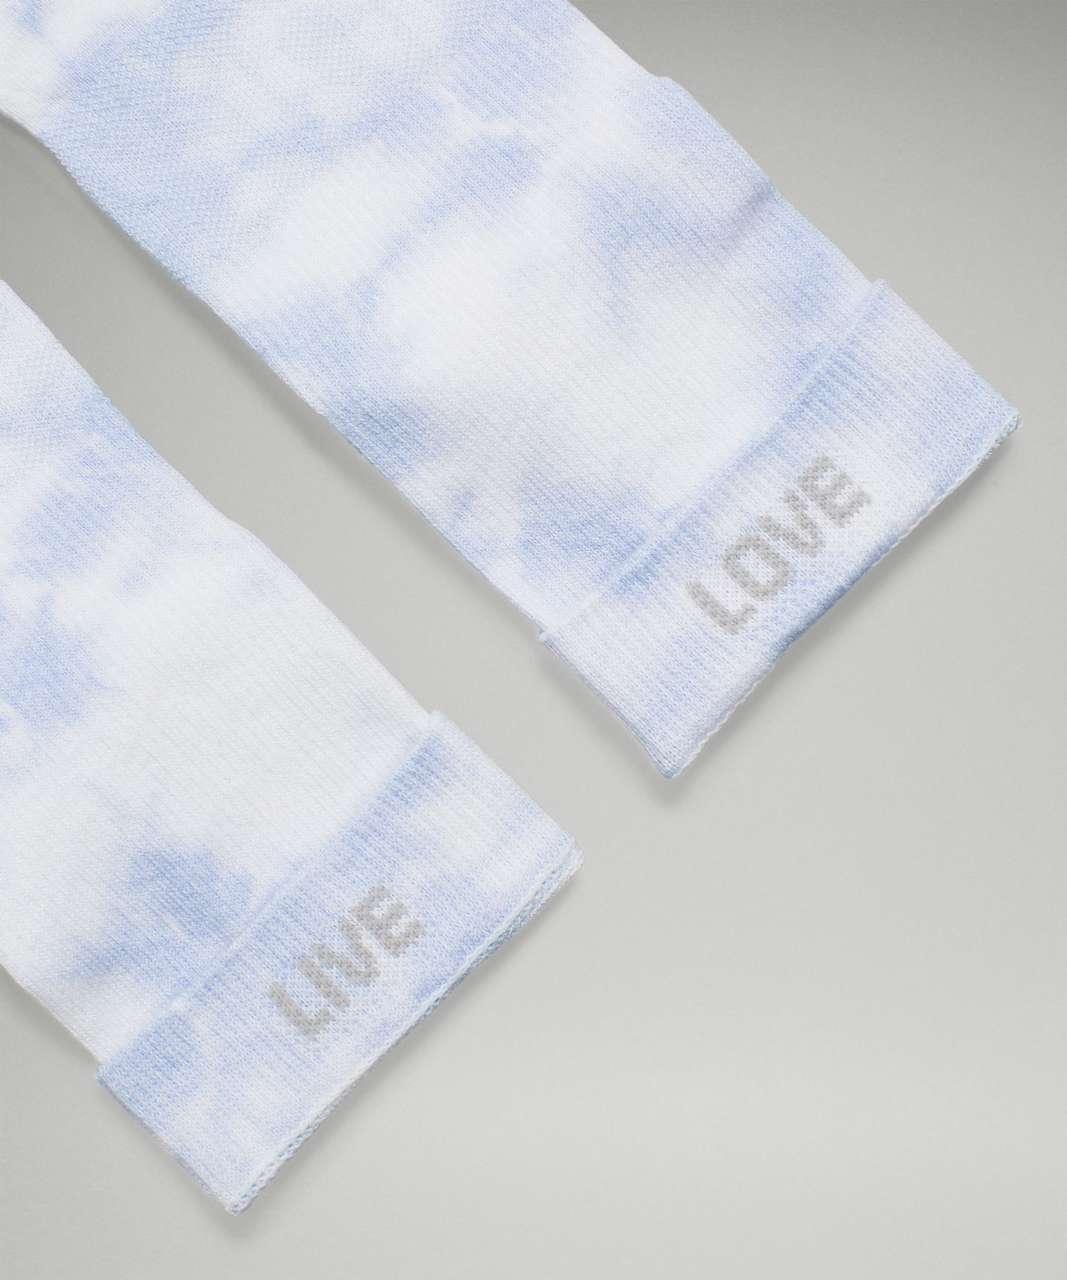 Lululemon Daily Stride Mid-Crew Sock *Tie Dye - Blue Linen